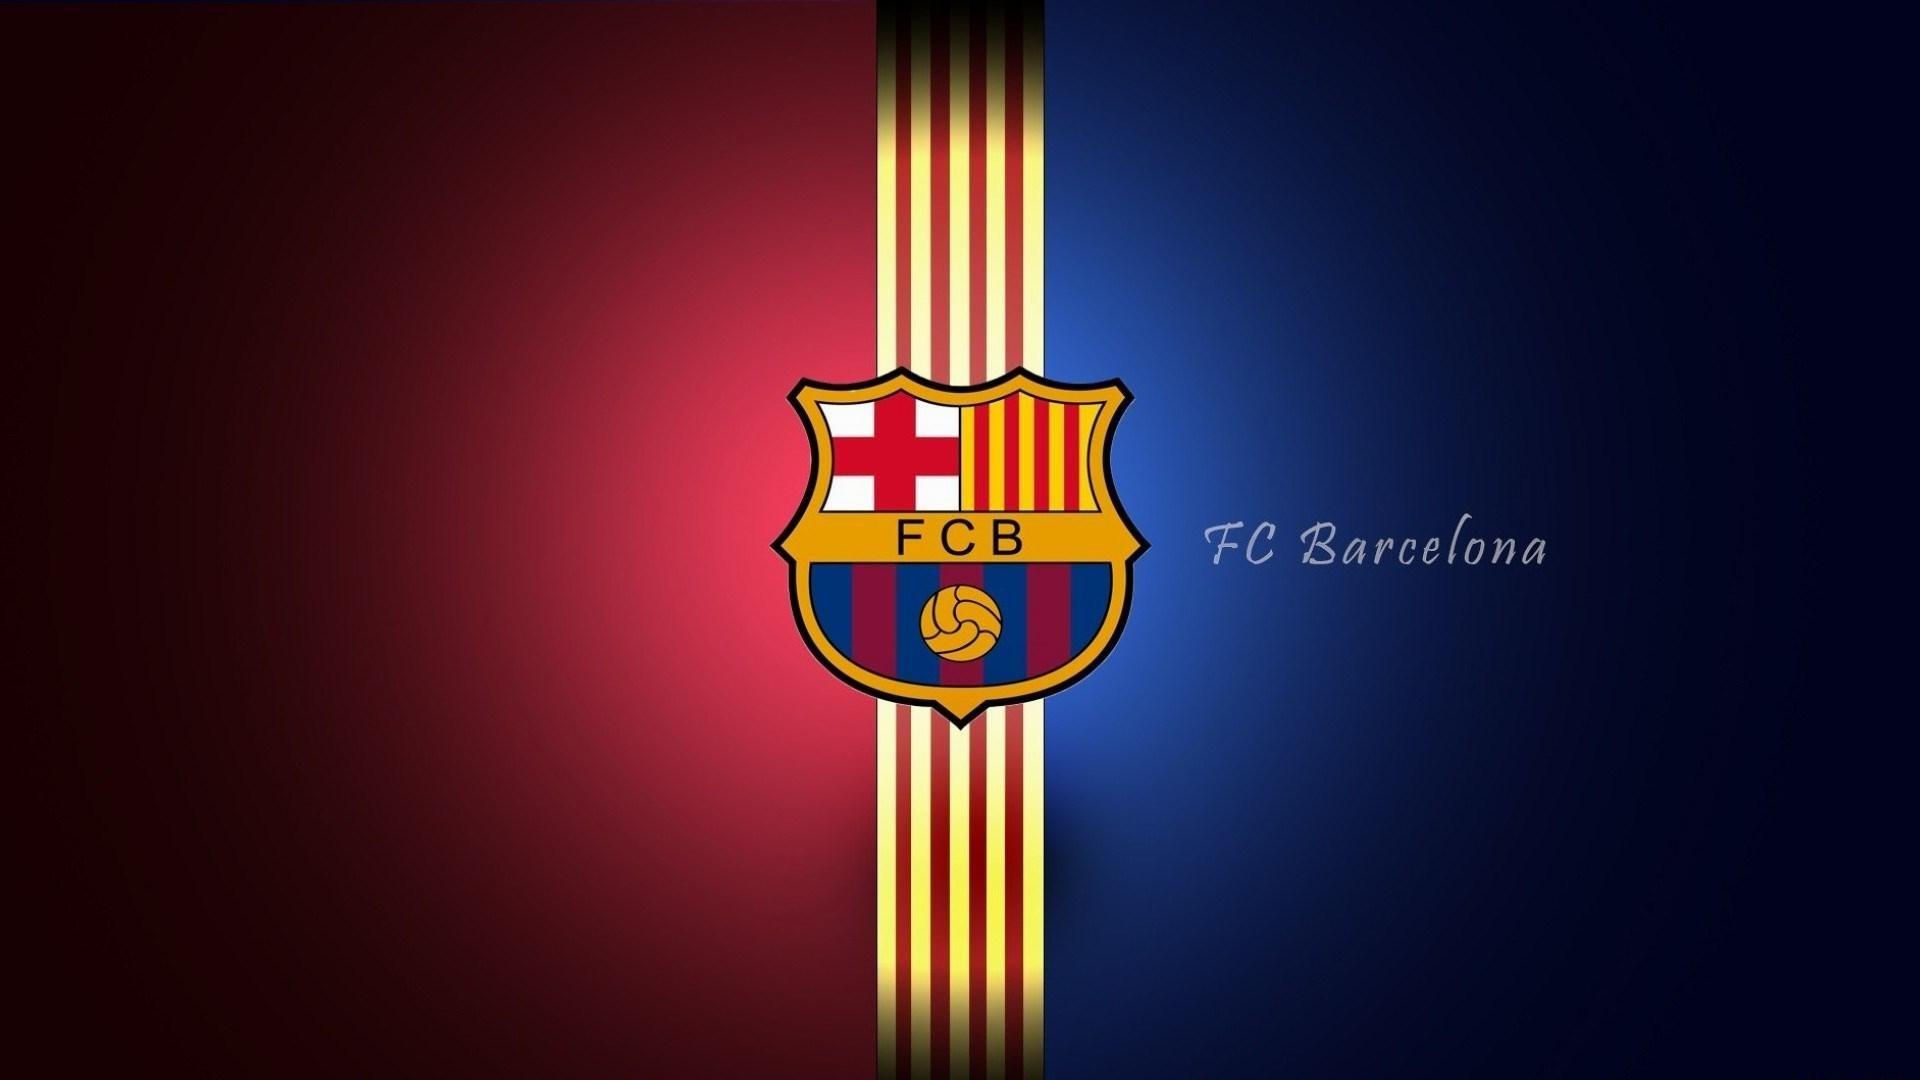 fc-barcelona-Full-HD-Photo-1920×1080-wallpaper-wp6405066